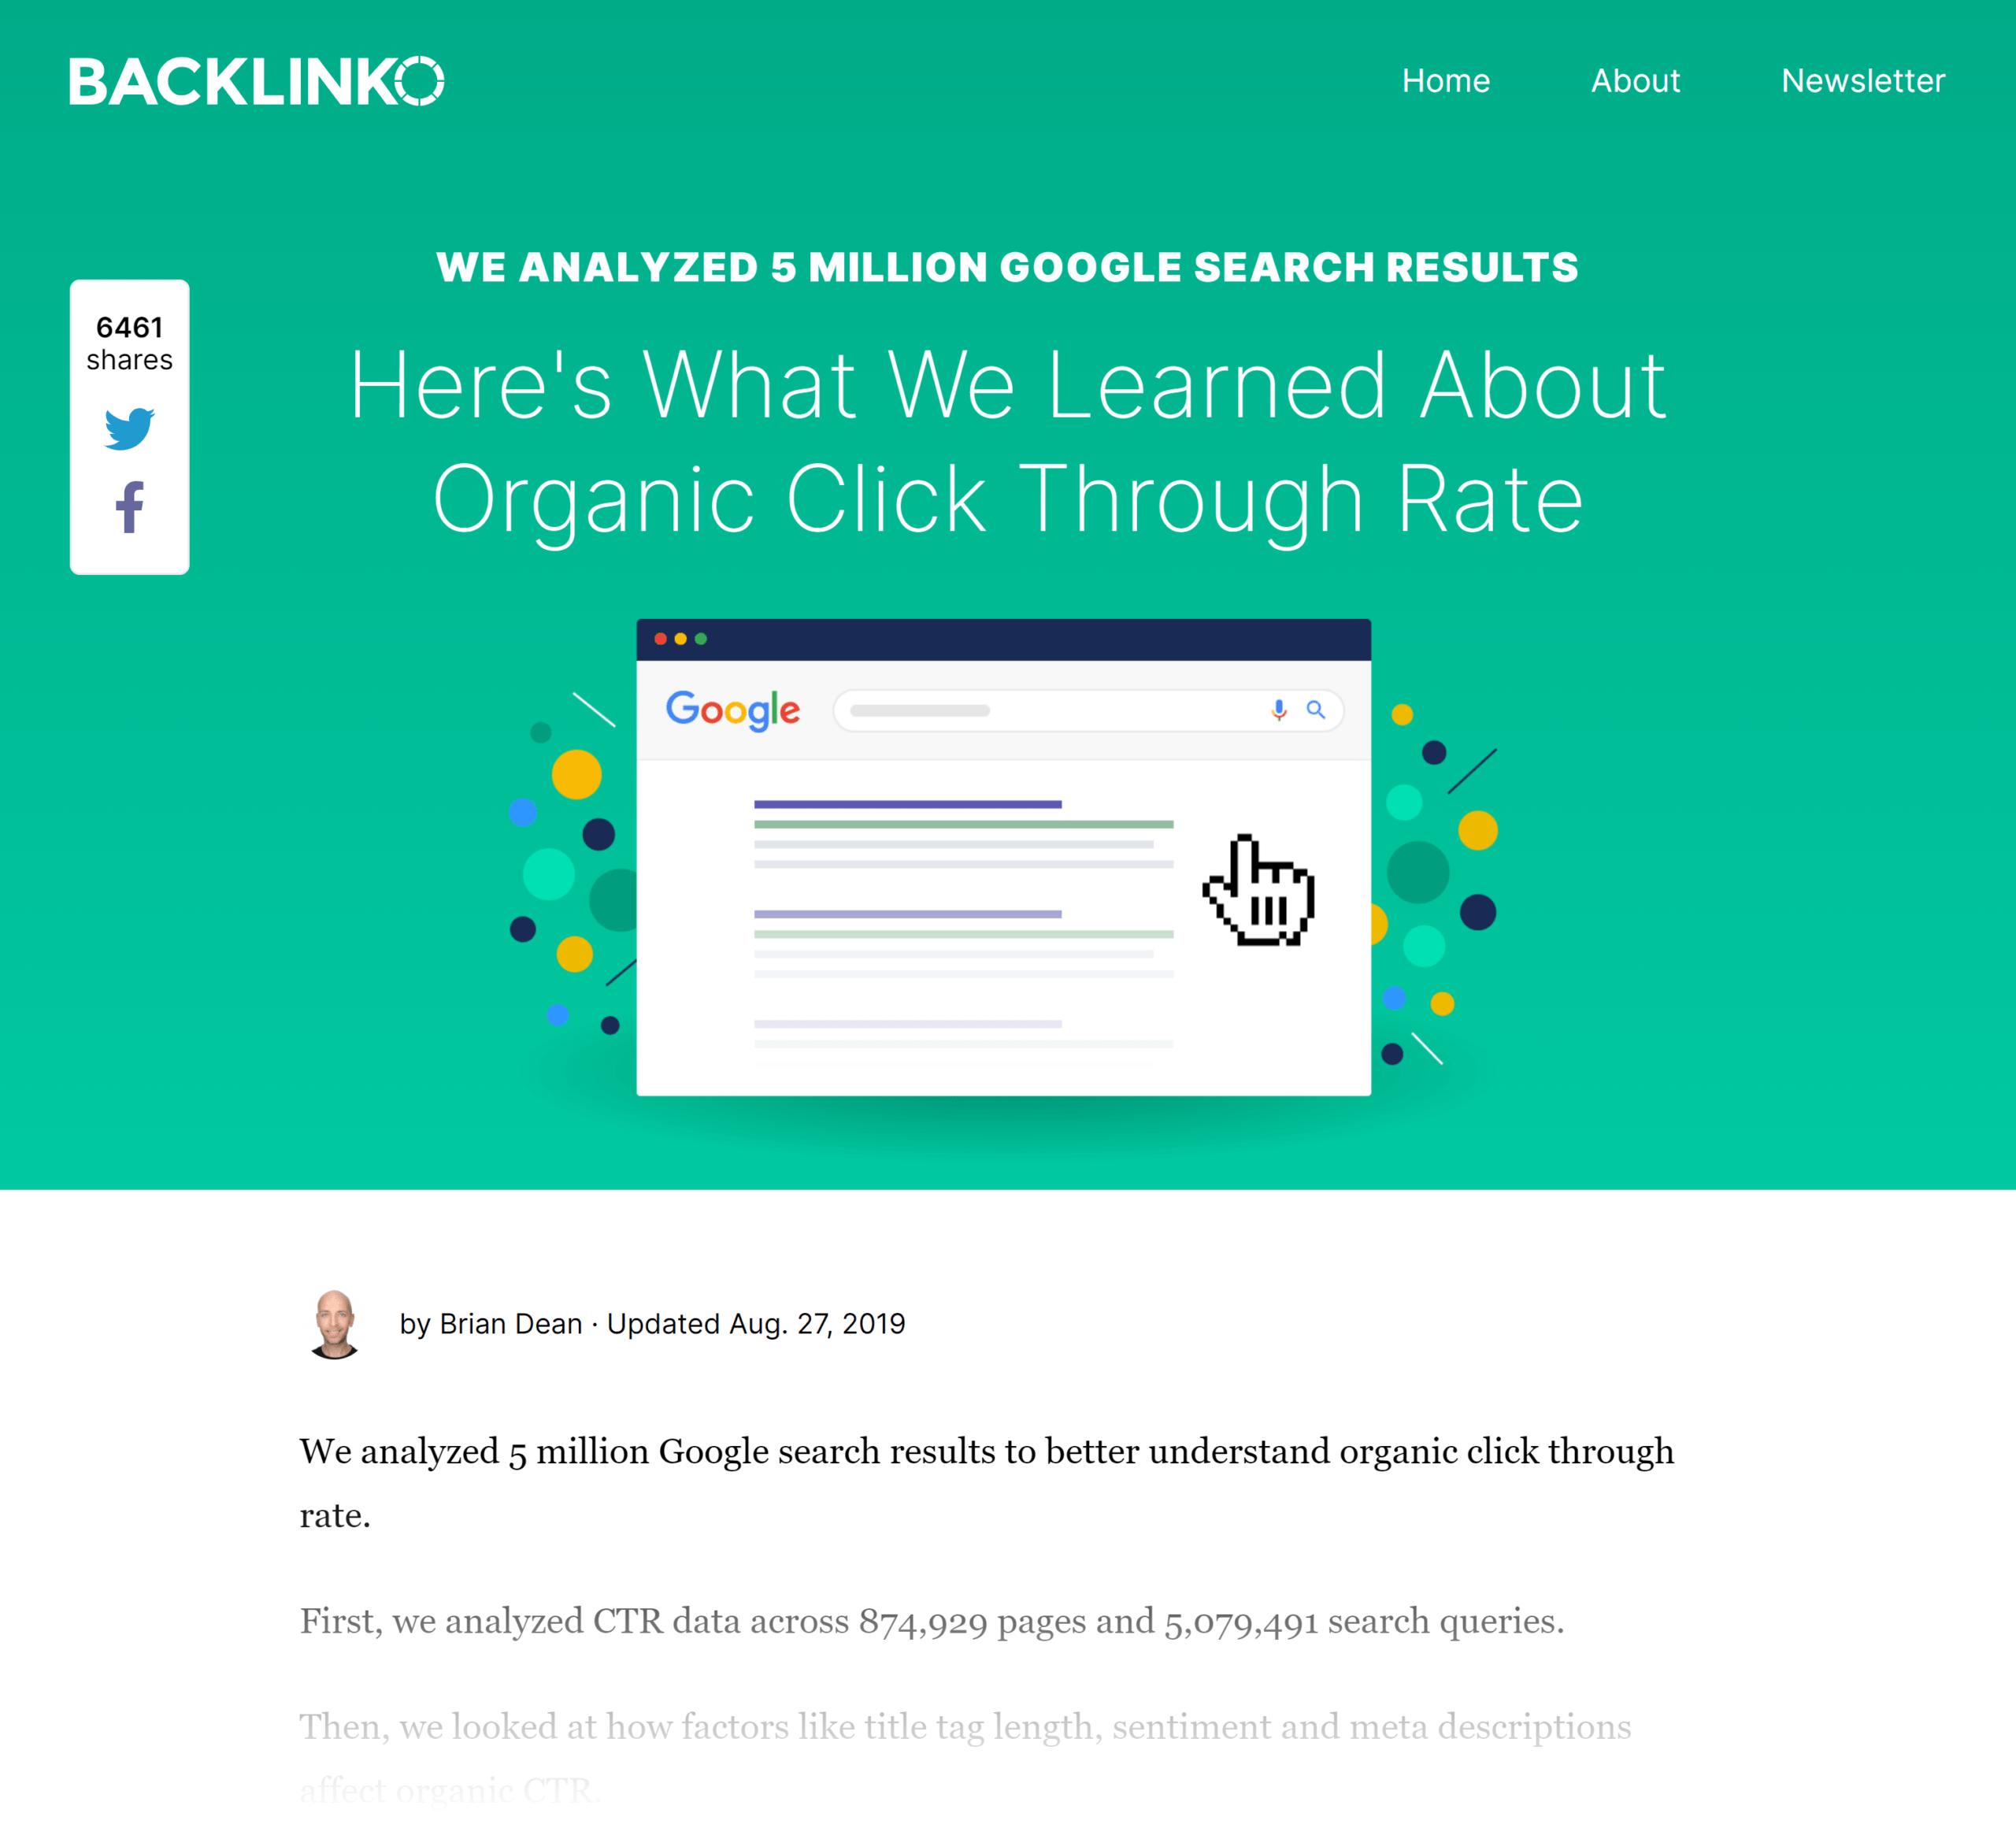 Backlinko - Google CTR stats